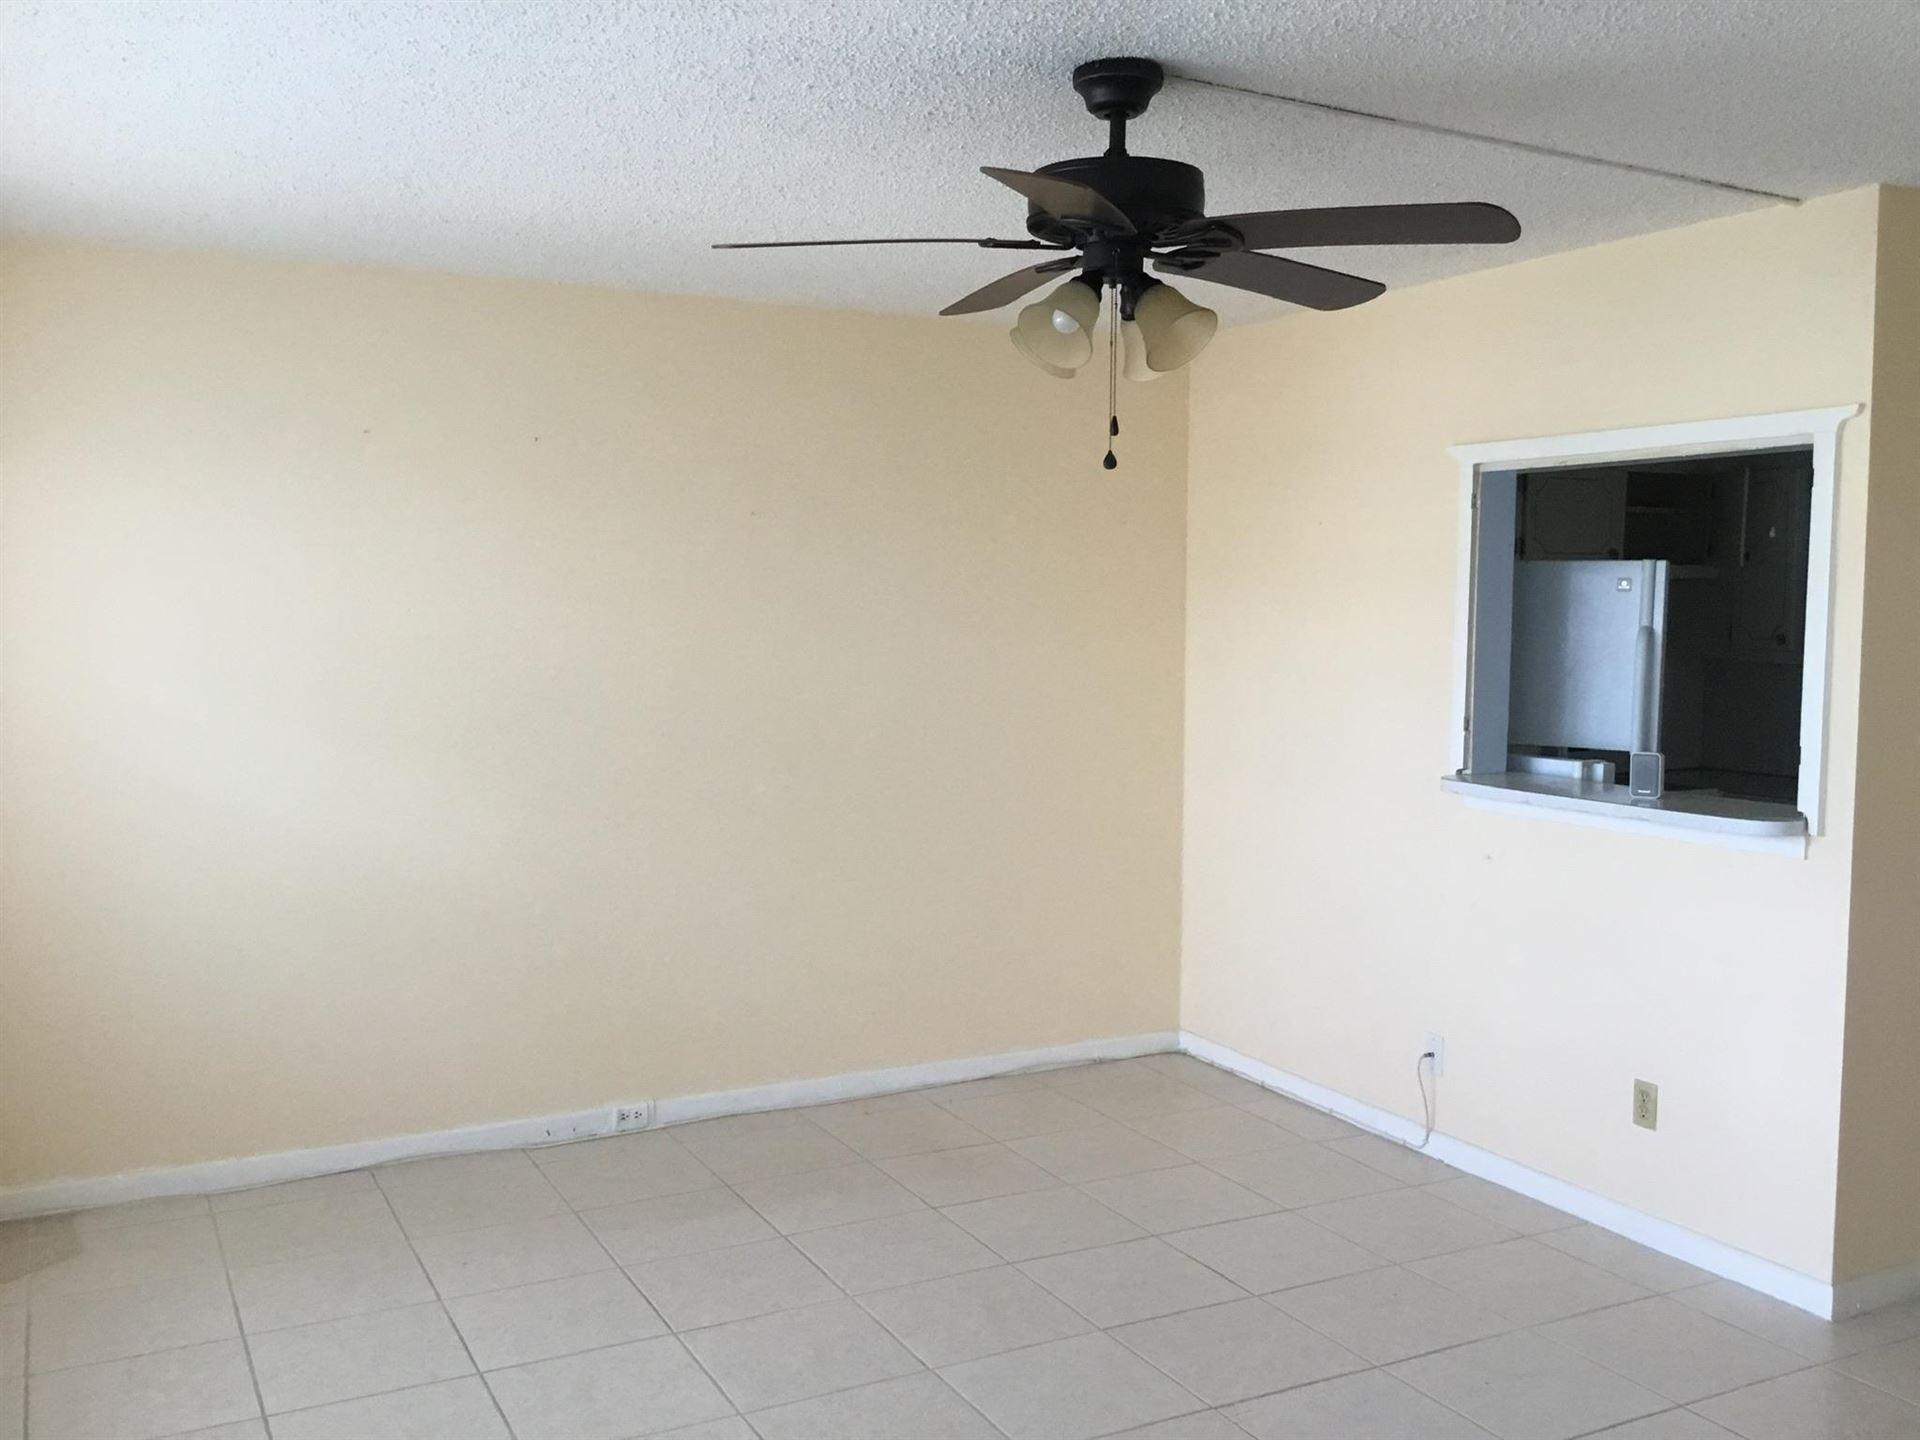 378 Chatham S S, West Palm Beach, FL 33417 - MLS#: RX-10693296